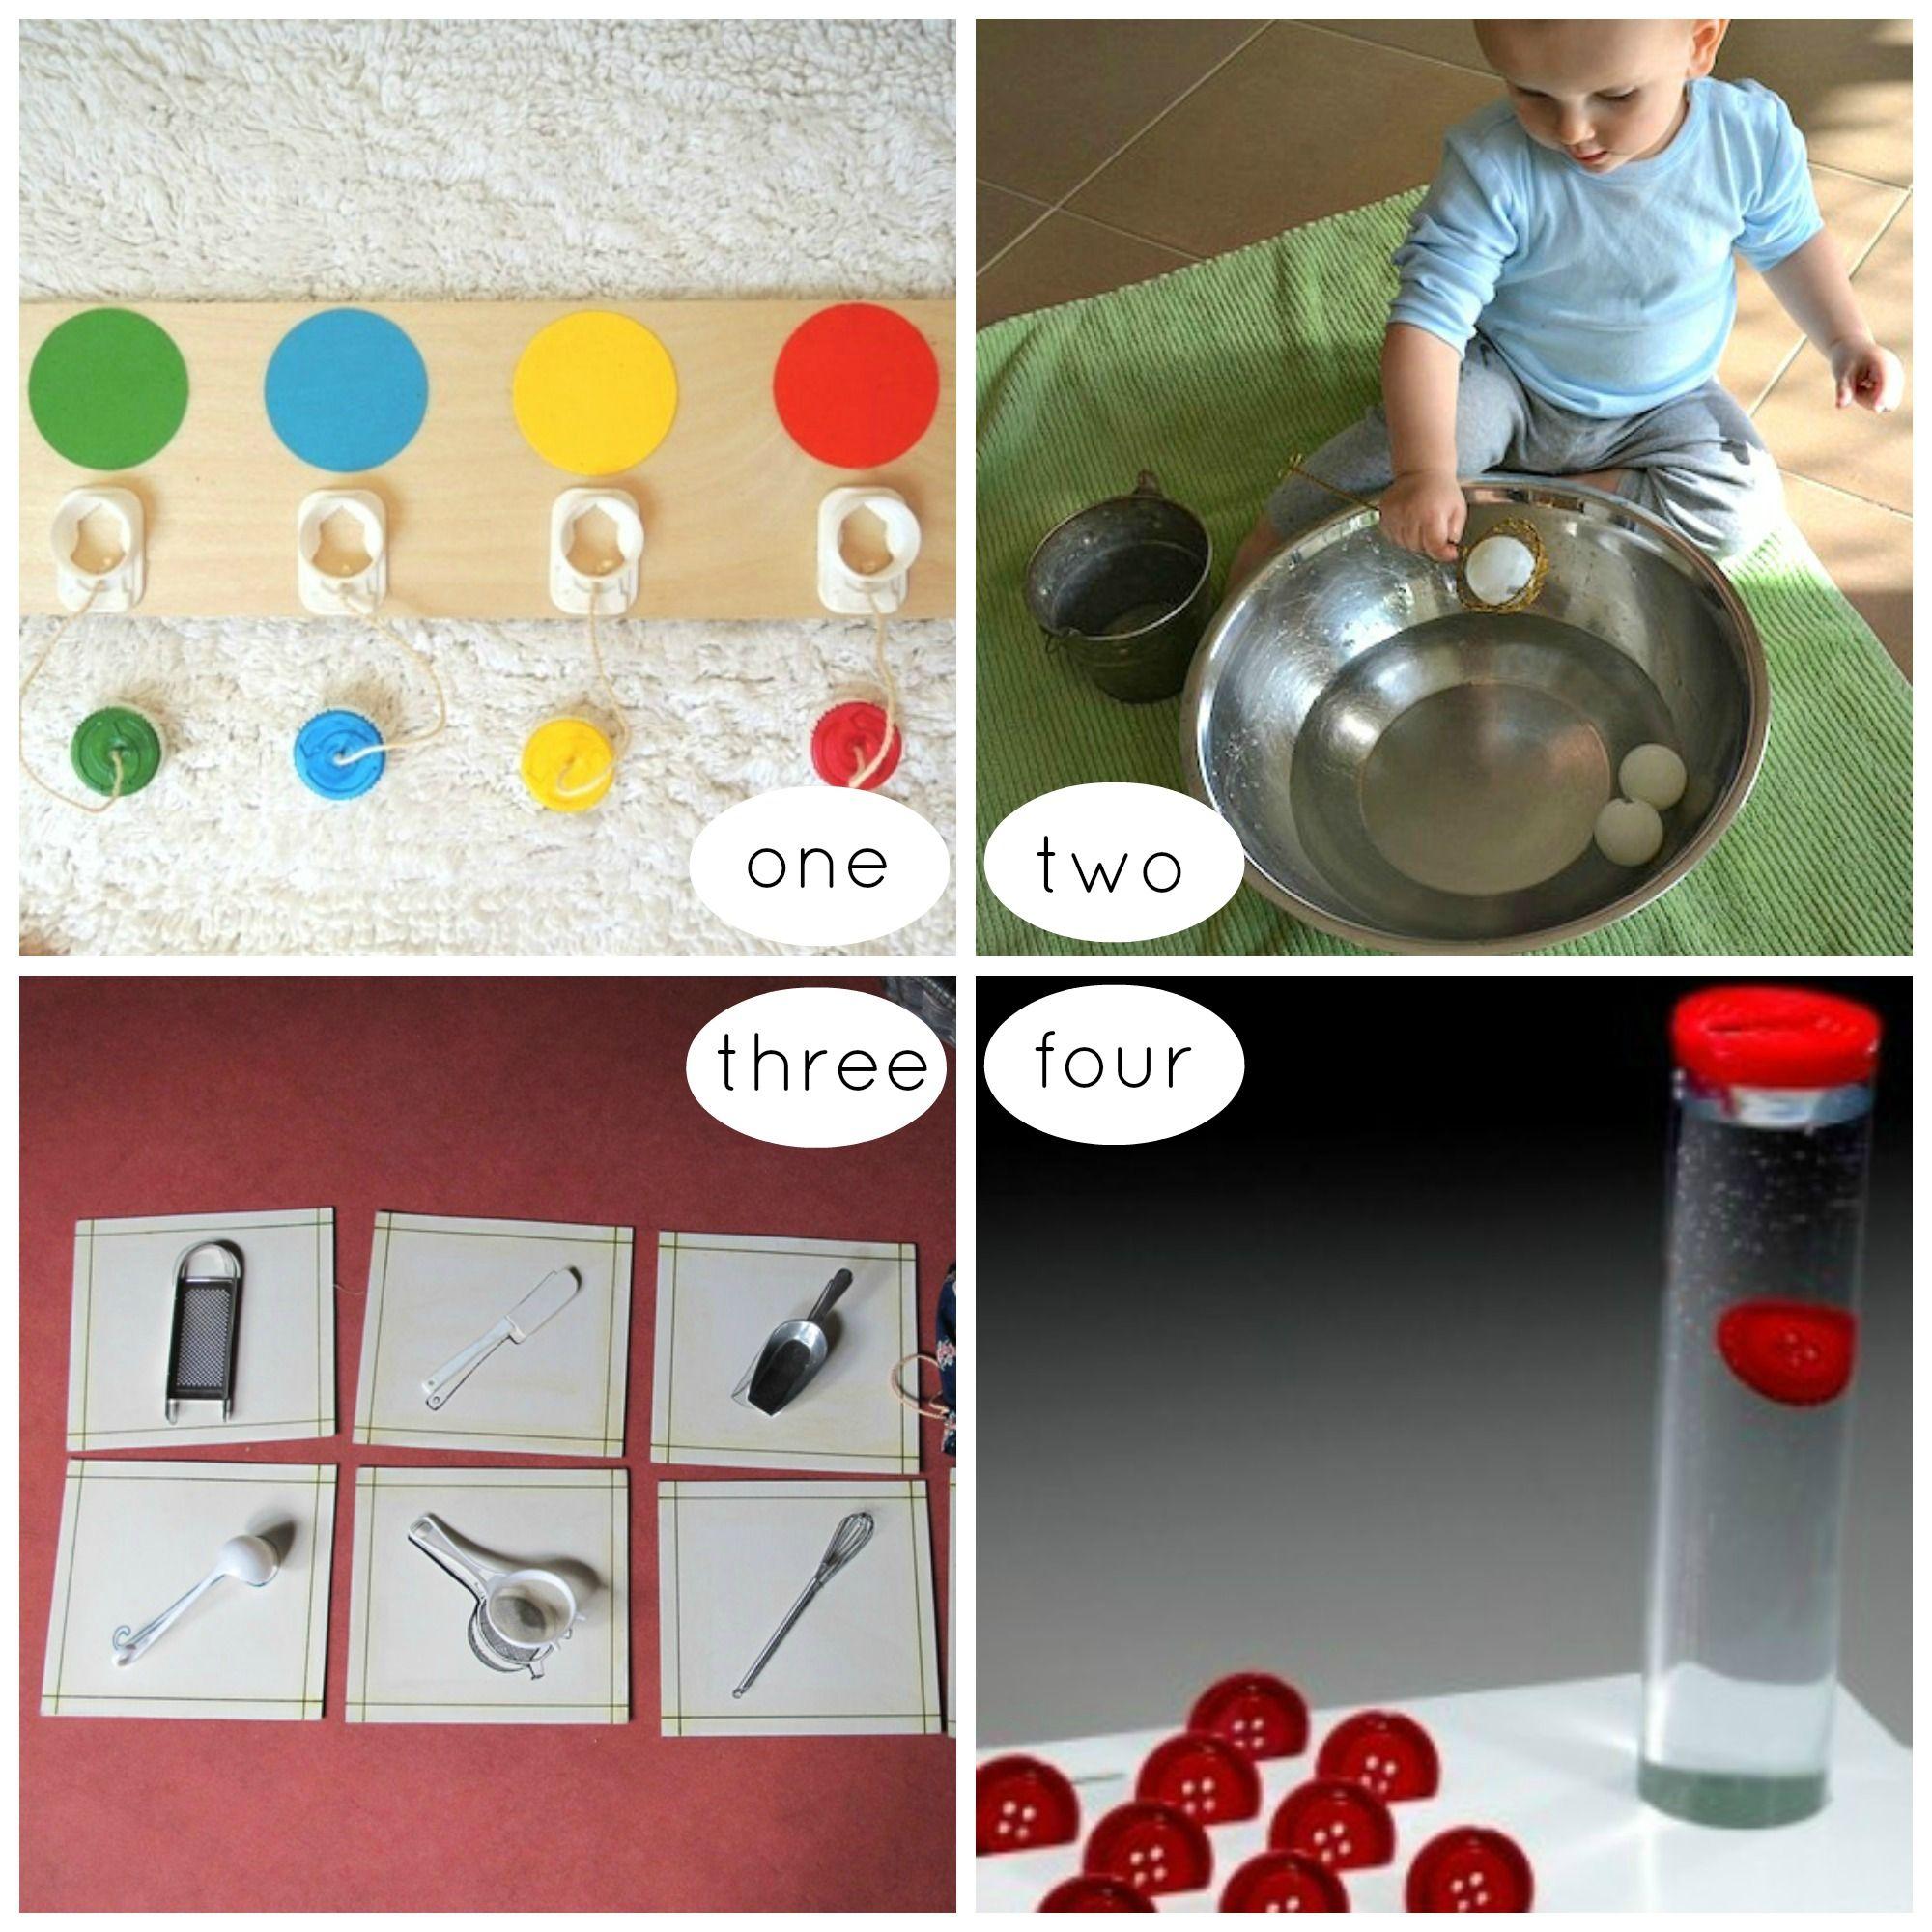 Montessori Toddler Activities Montessori Activities Montessori Toddler Toddler Activities